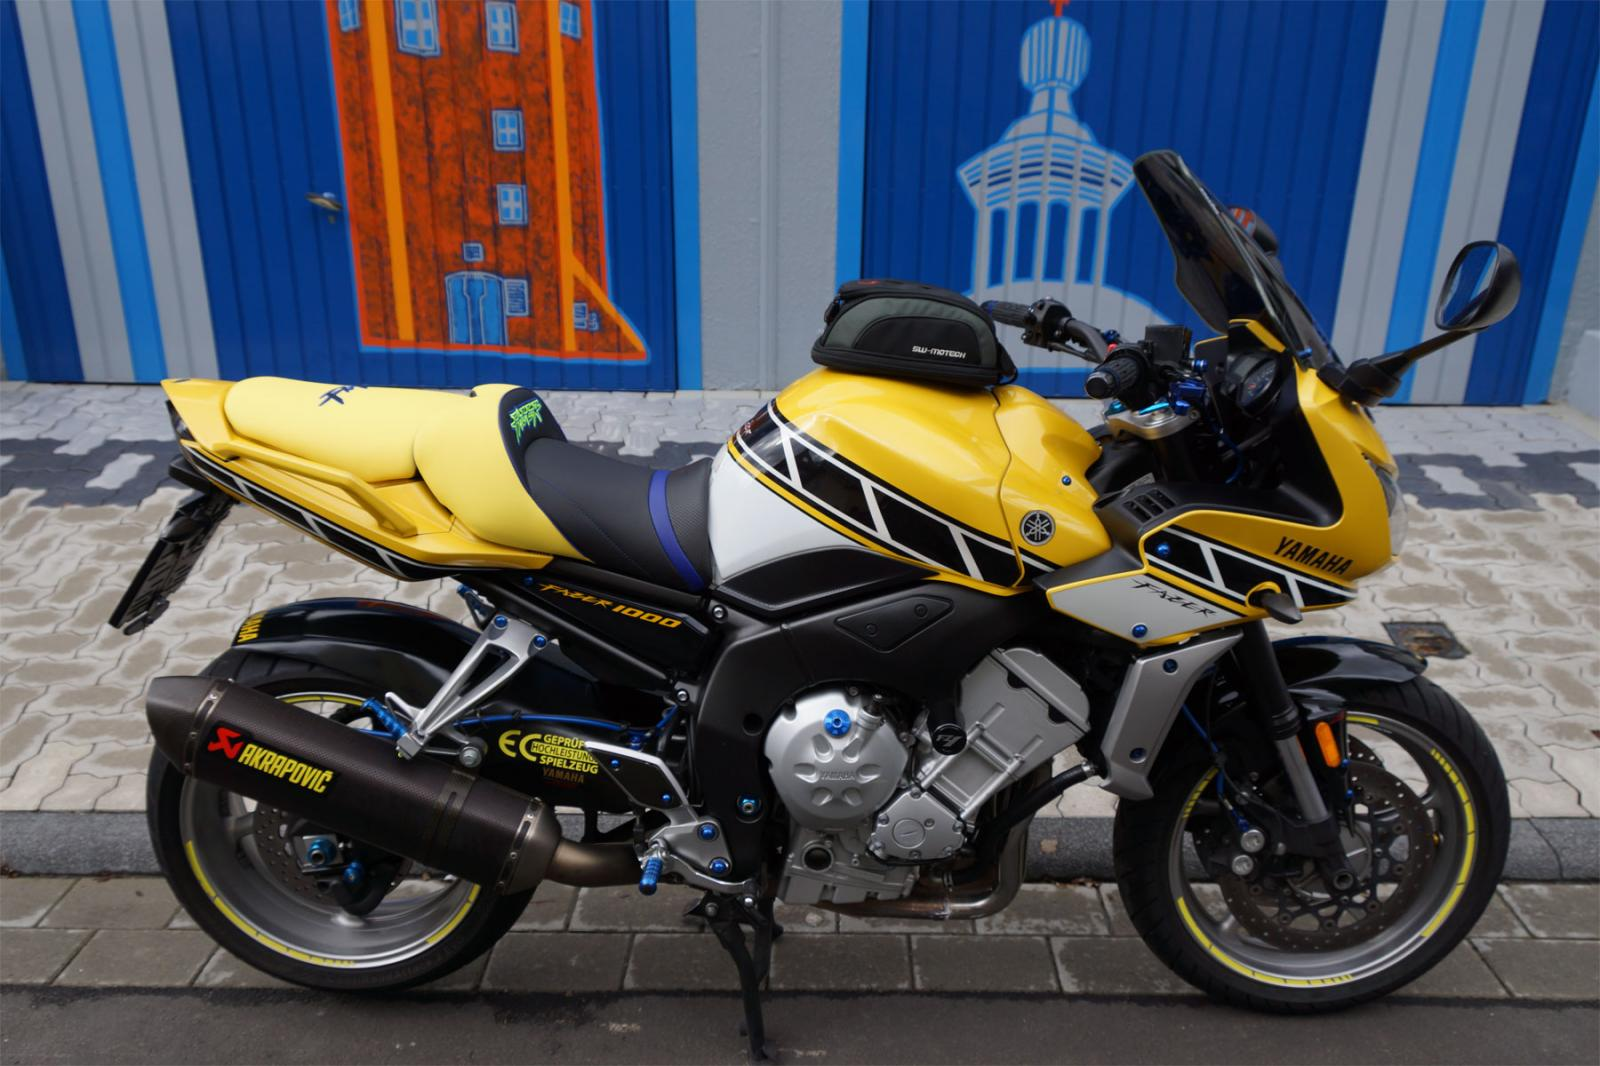 Yamaha Fz1 S Gt 2006 Deluxe Seats Petrol Tank Covers